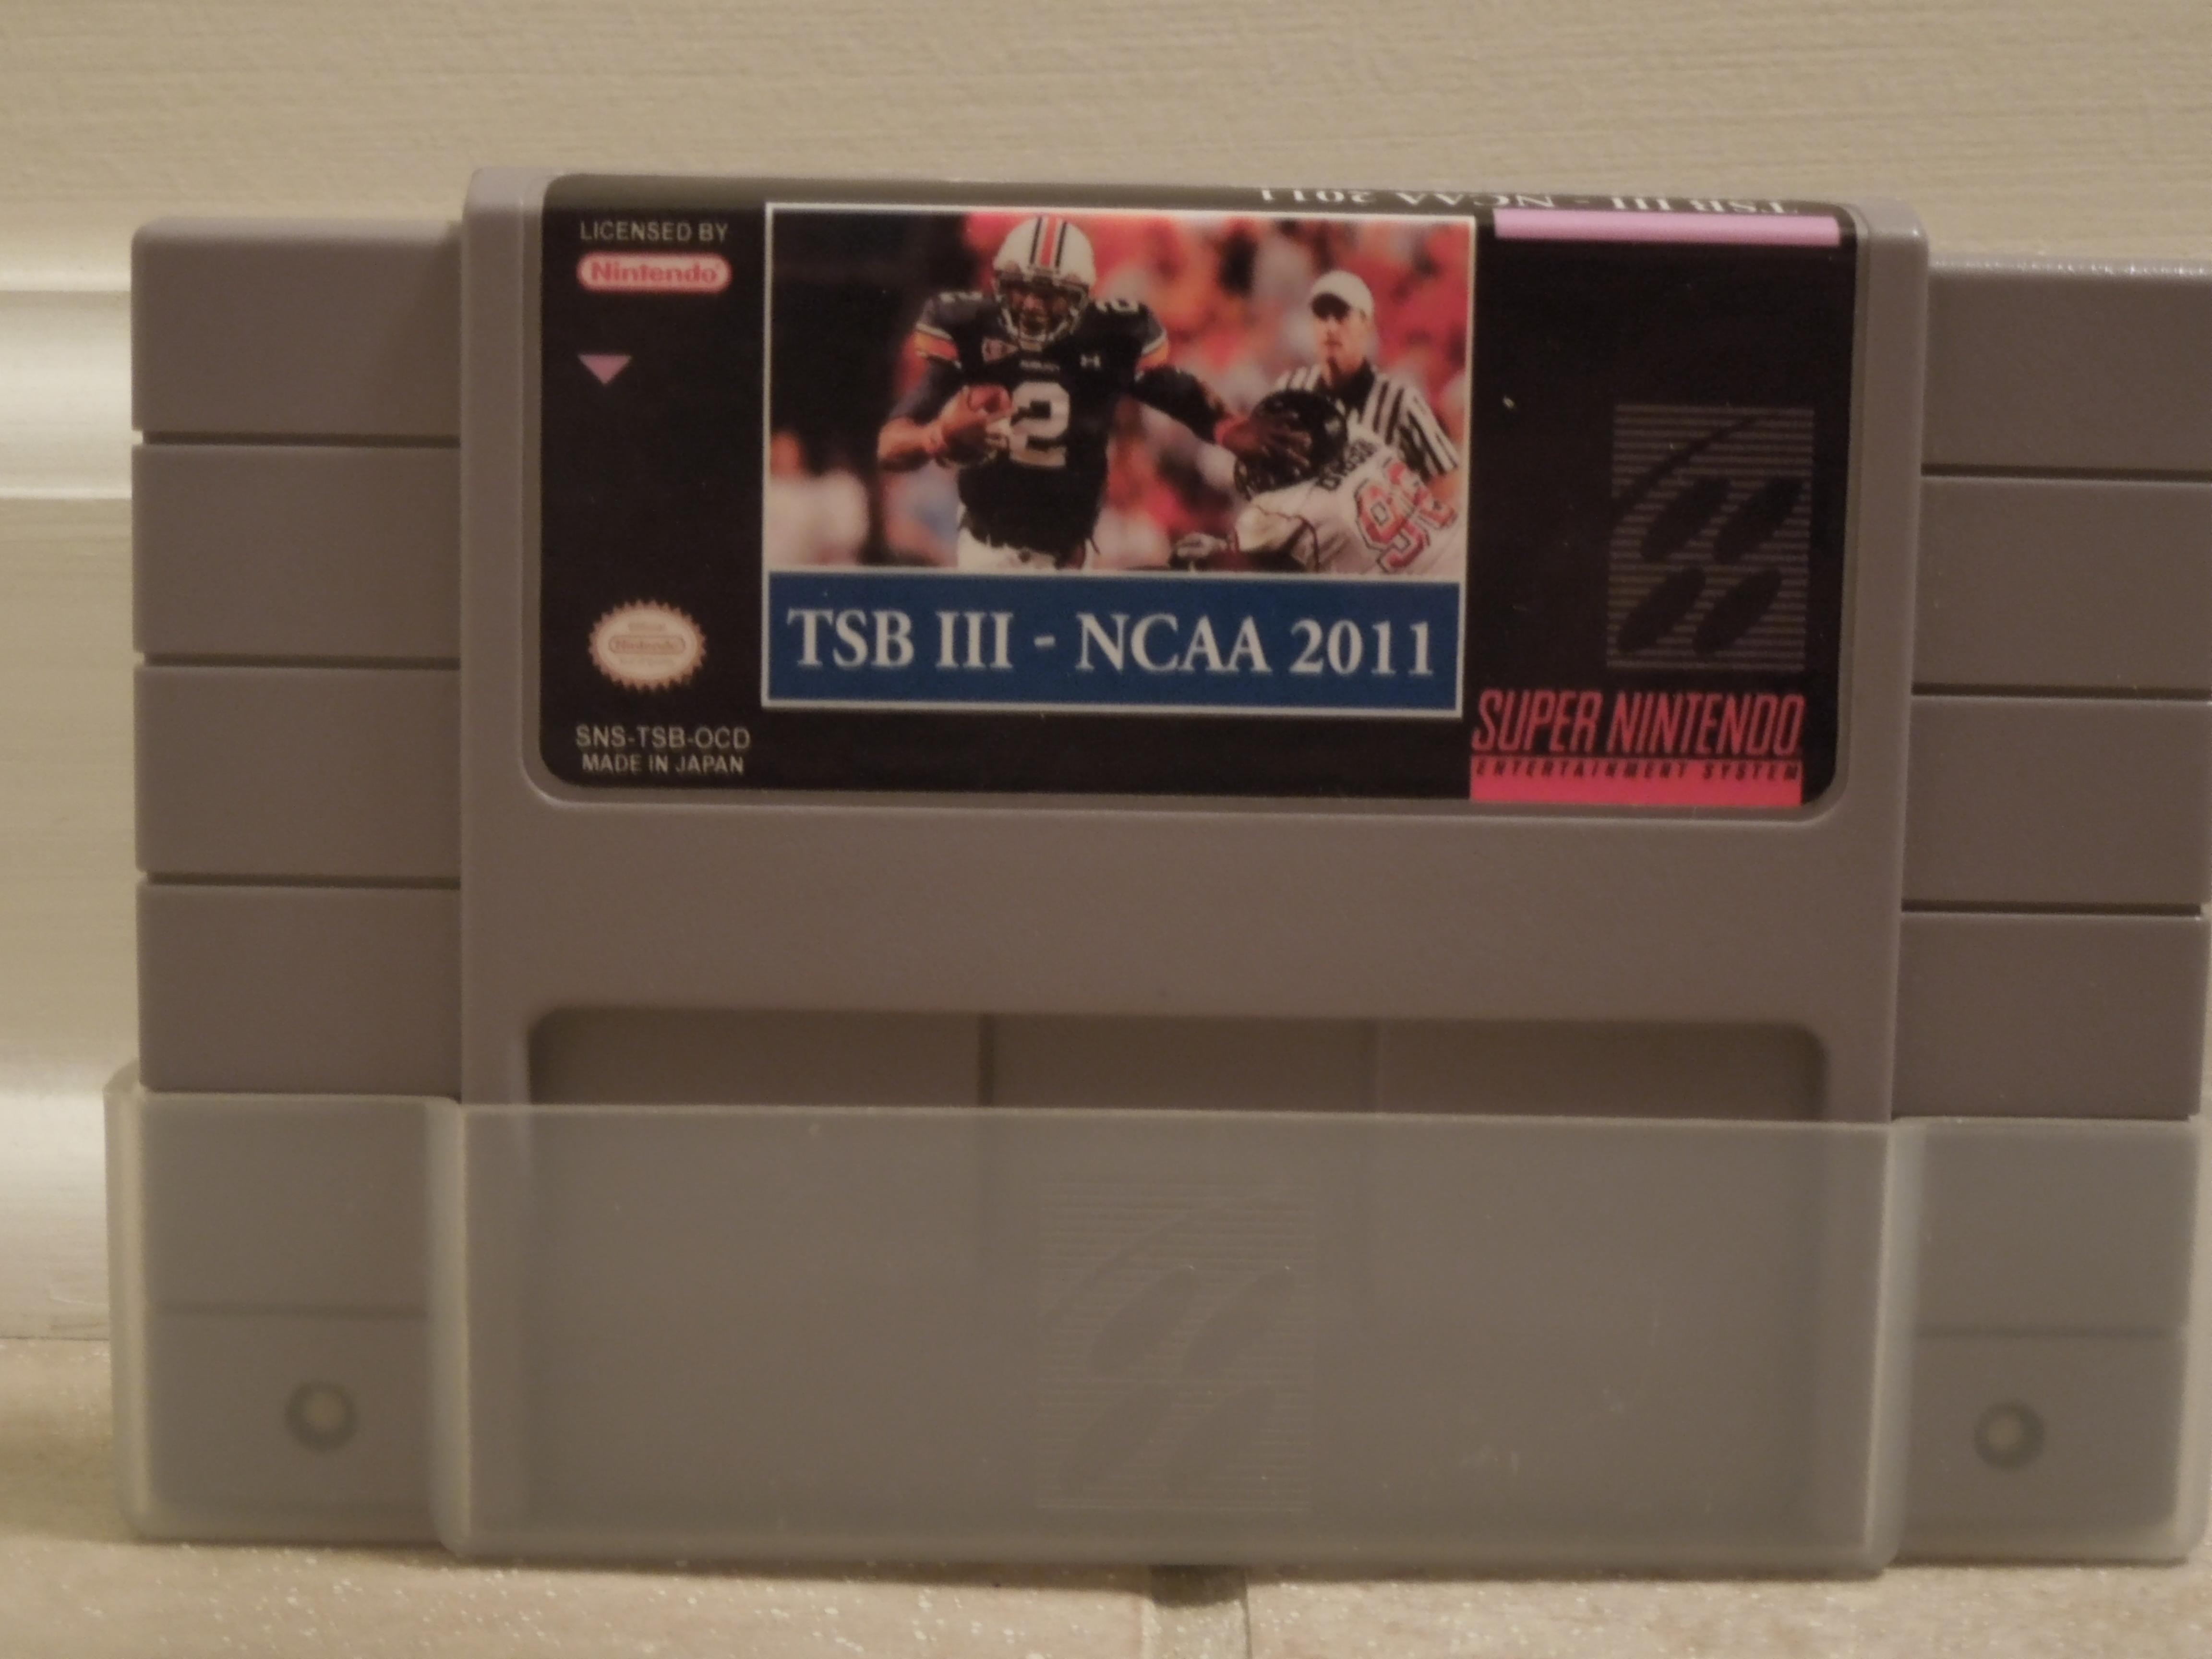 SNES – Tecmo Super Bowl III : NCAA 2011 | Obscure Video Games